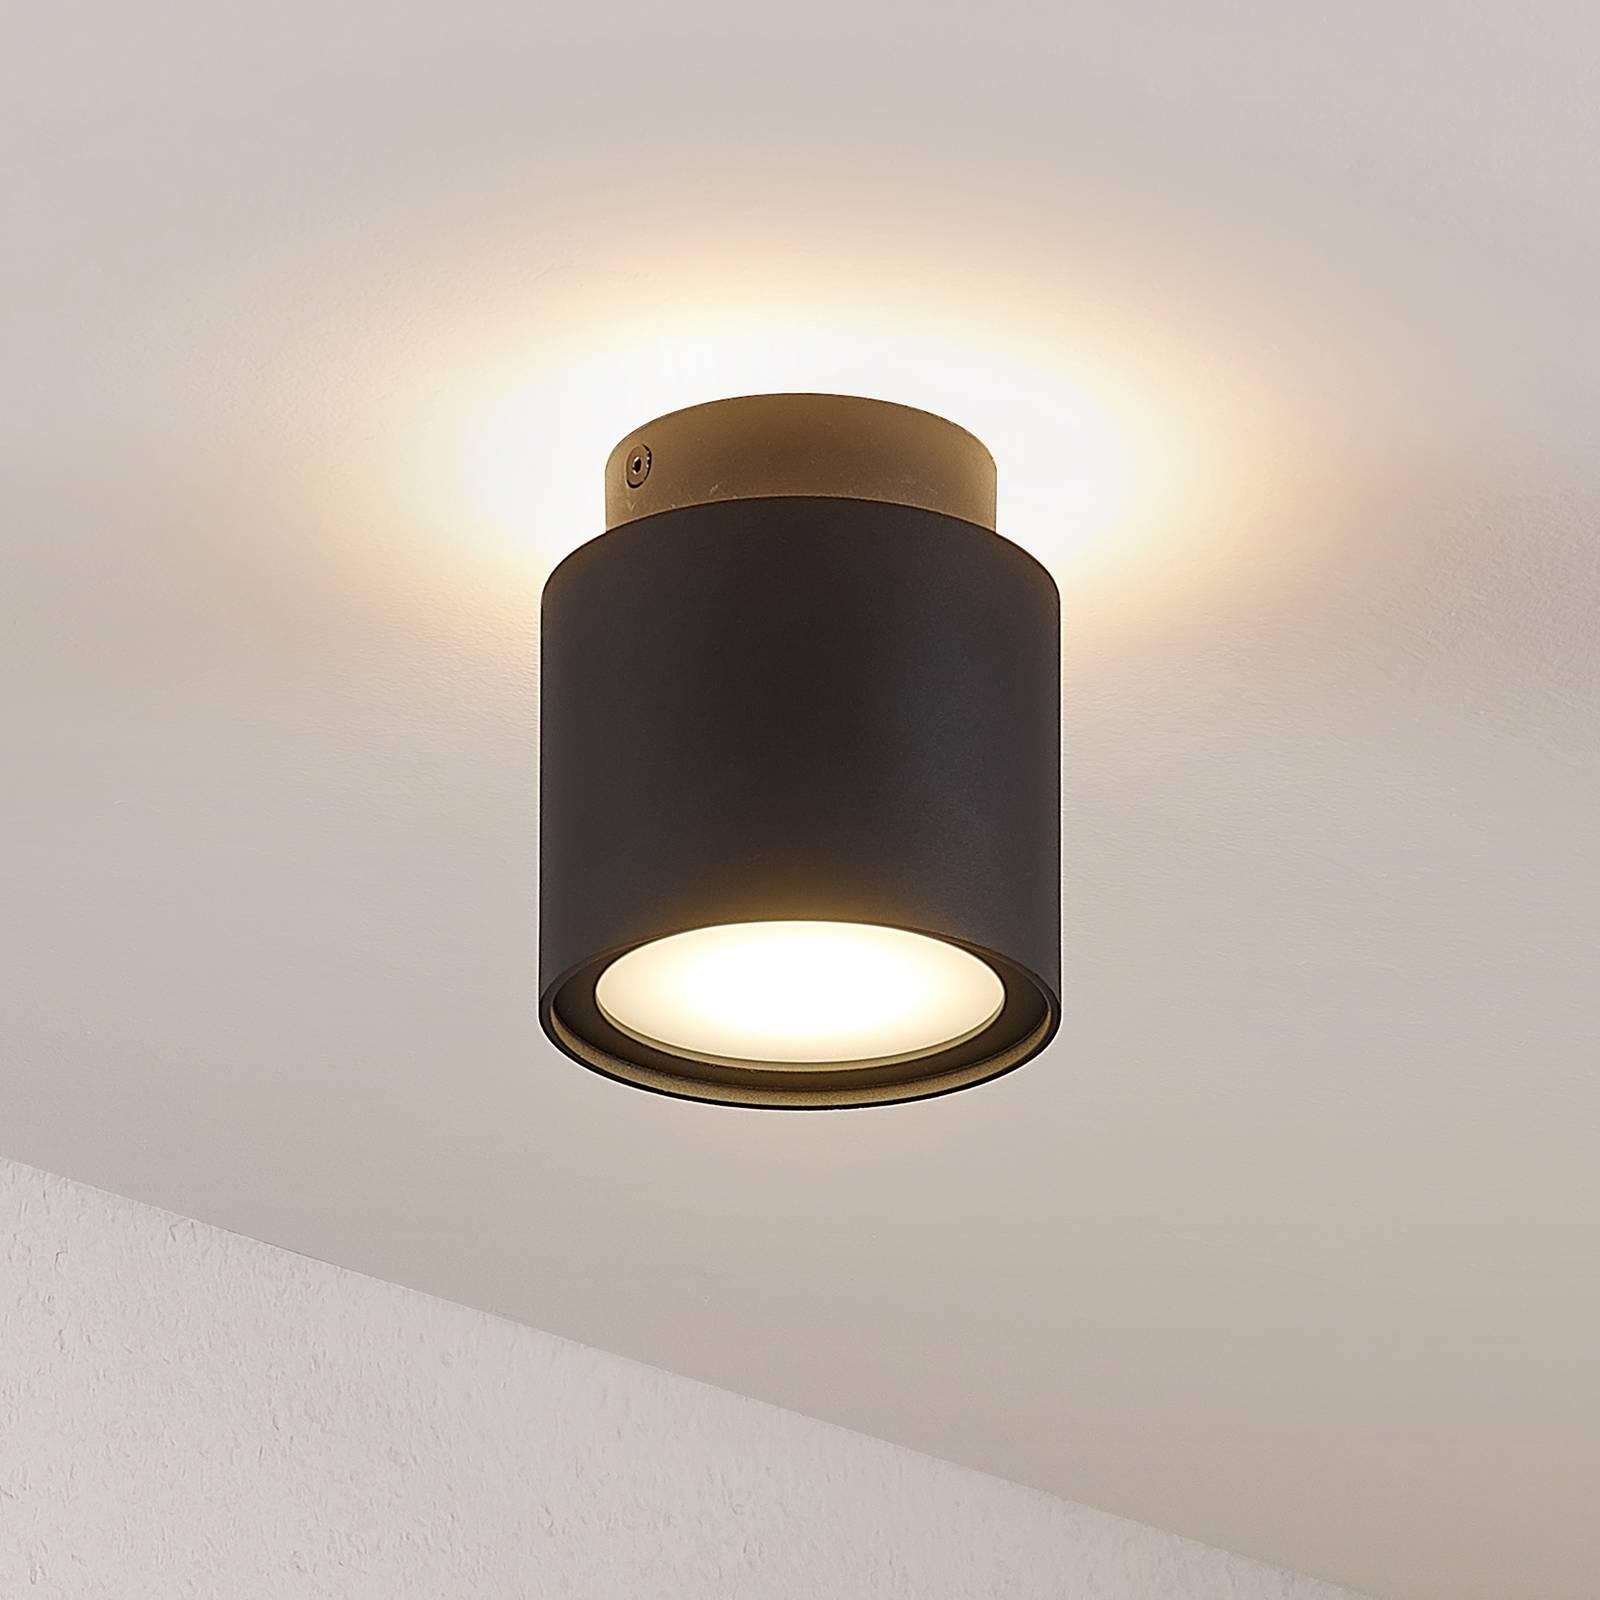 Arcchio Walisa -LED-kattovalaisin maitolasia musta